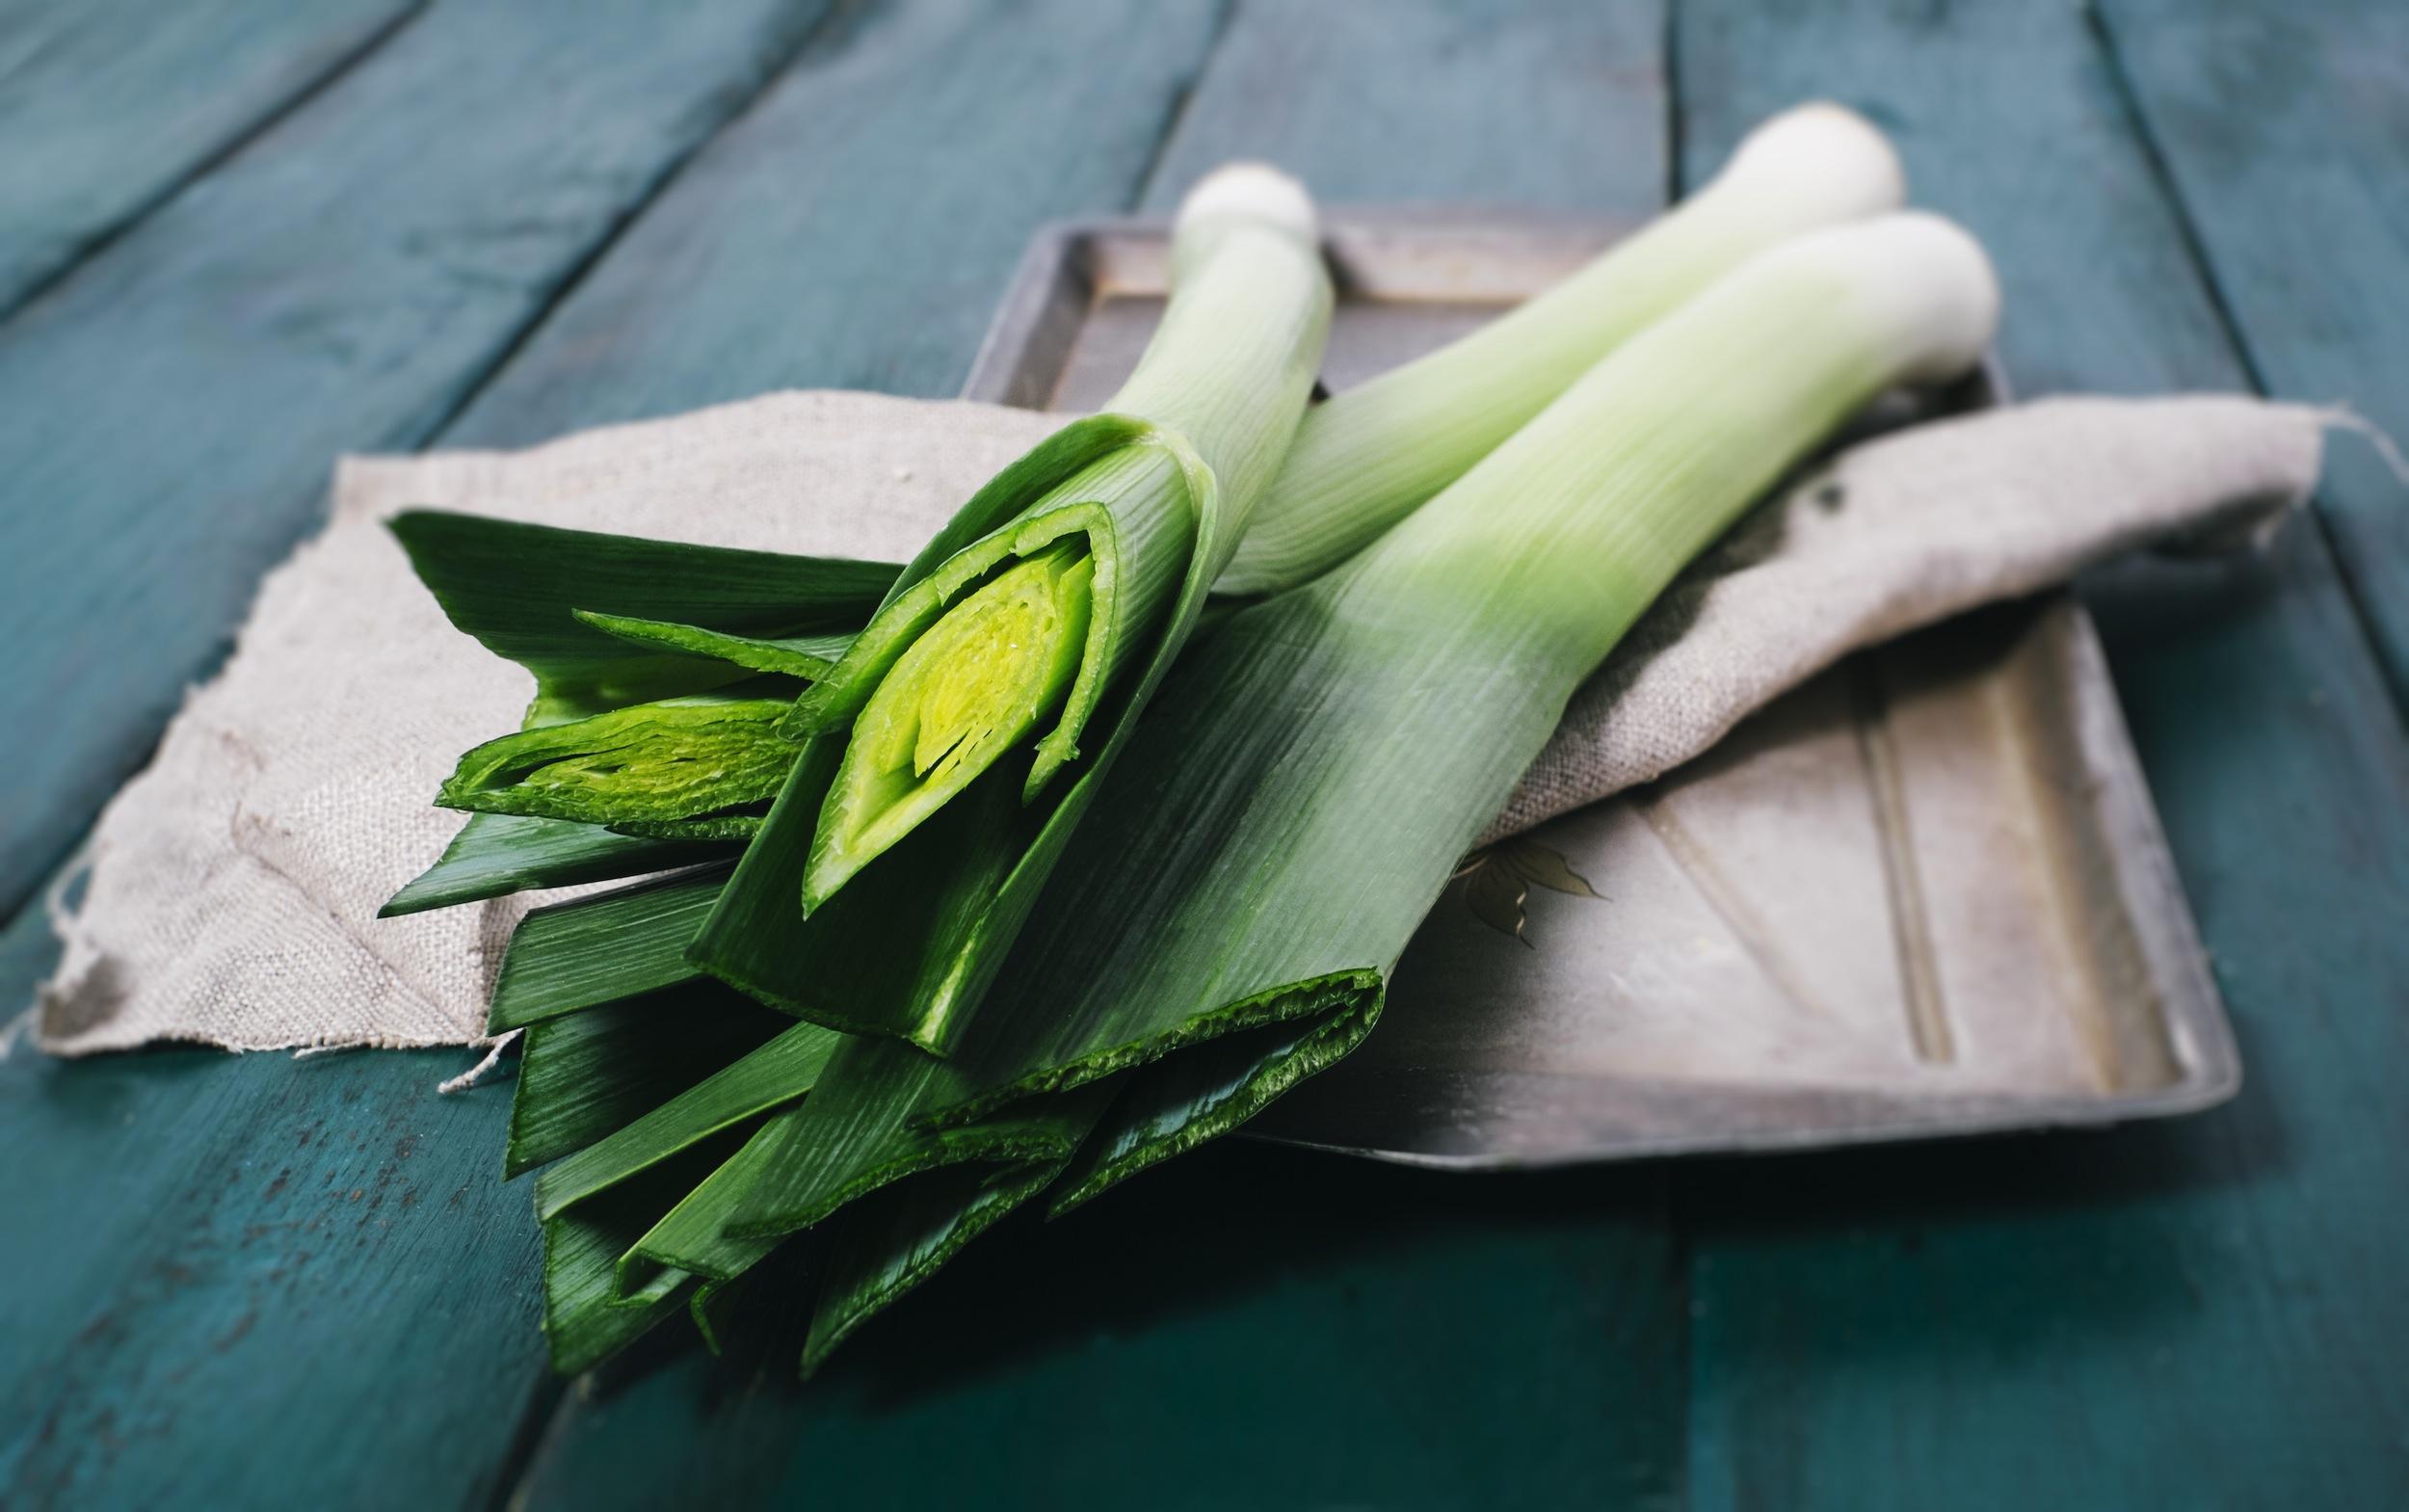 leeks - organic media network - an organic conversation - cook with leeks - how to use leeks - cooking leeks - leeks recipes